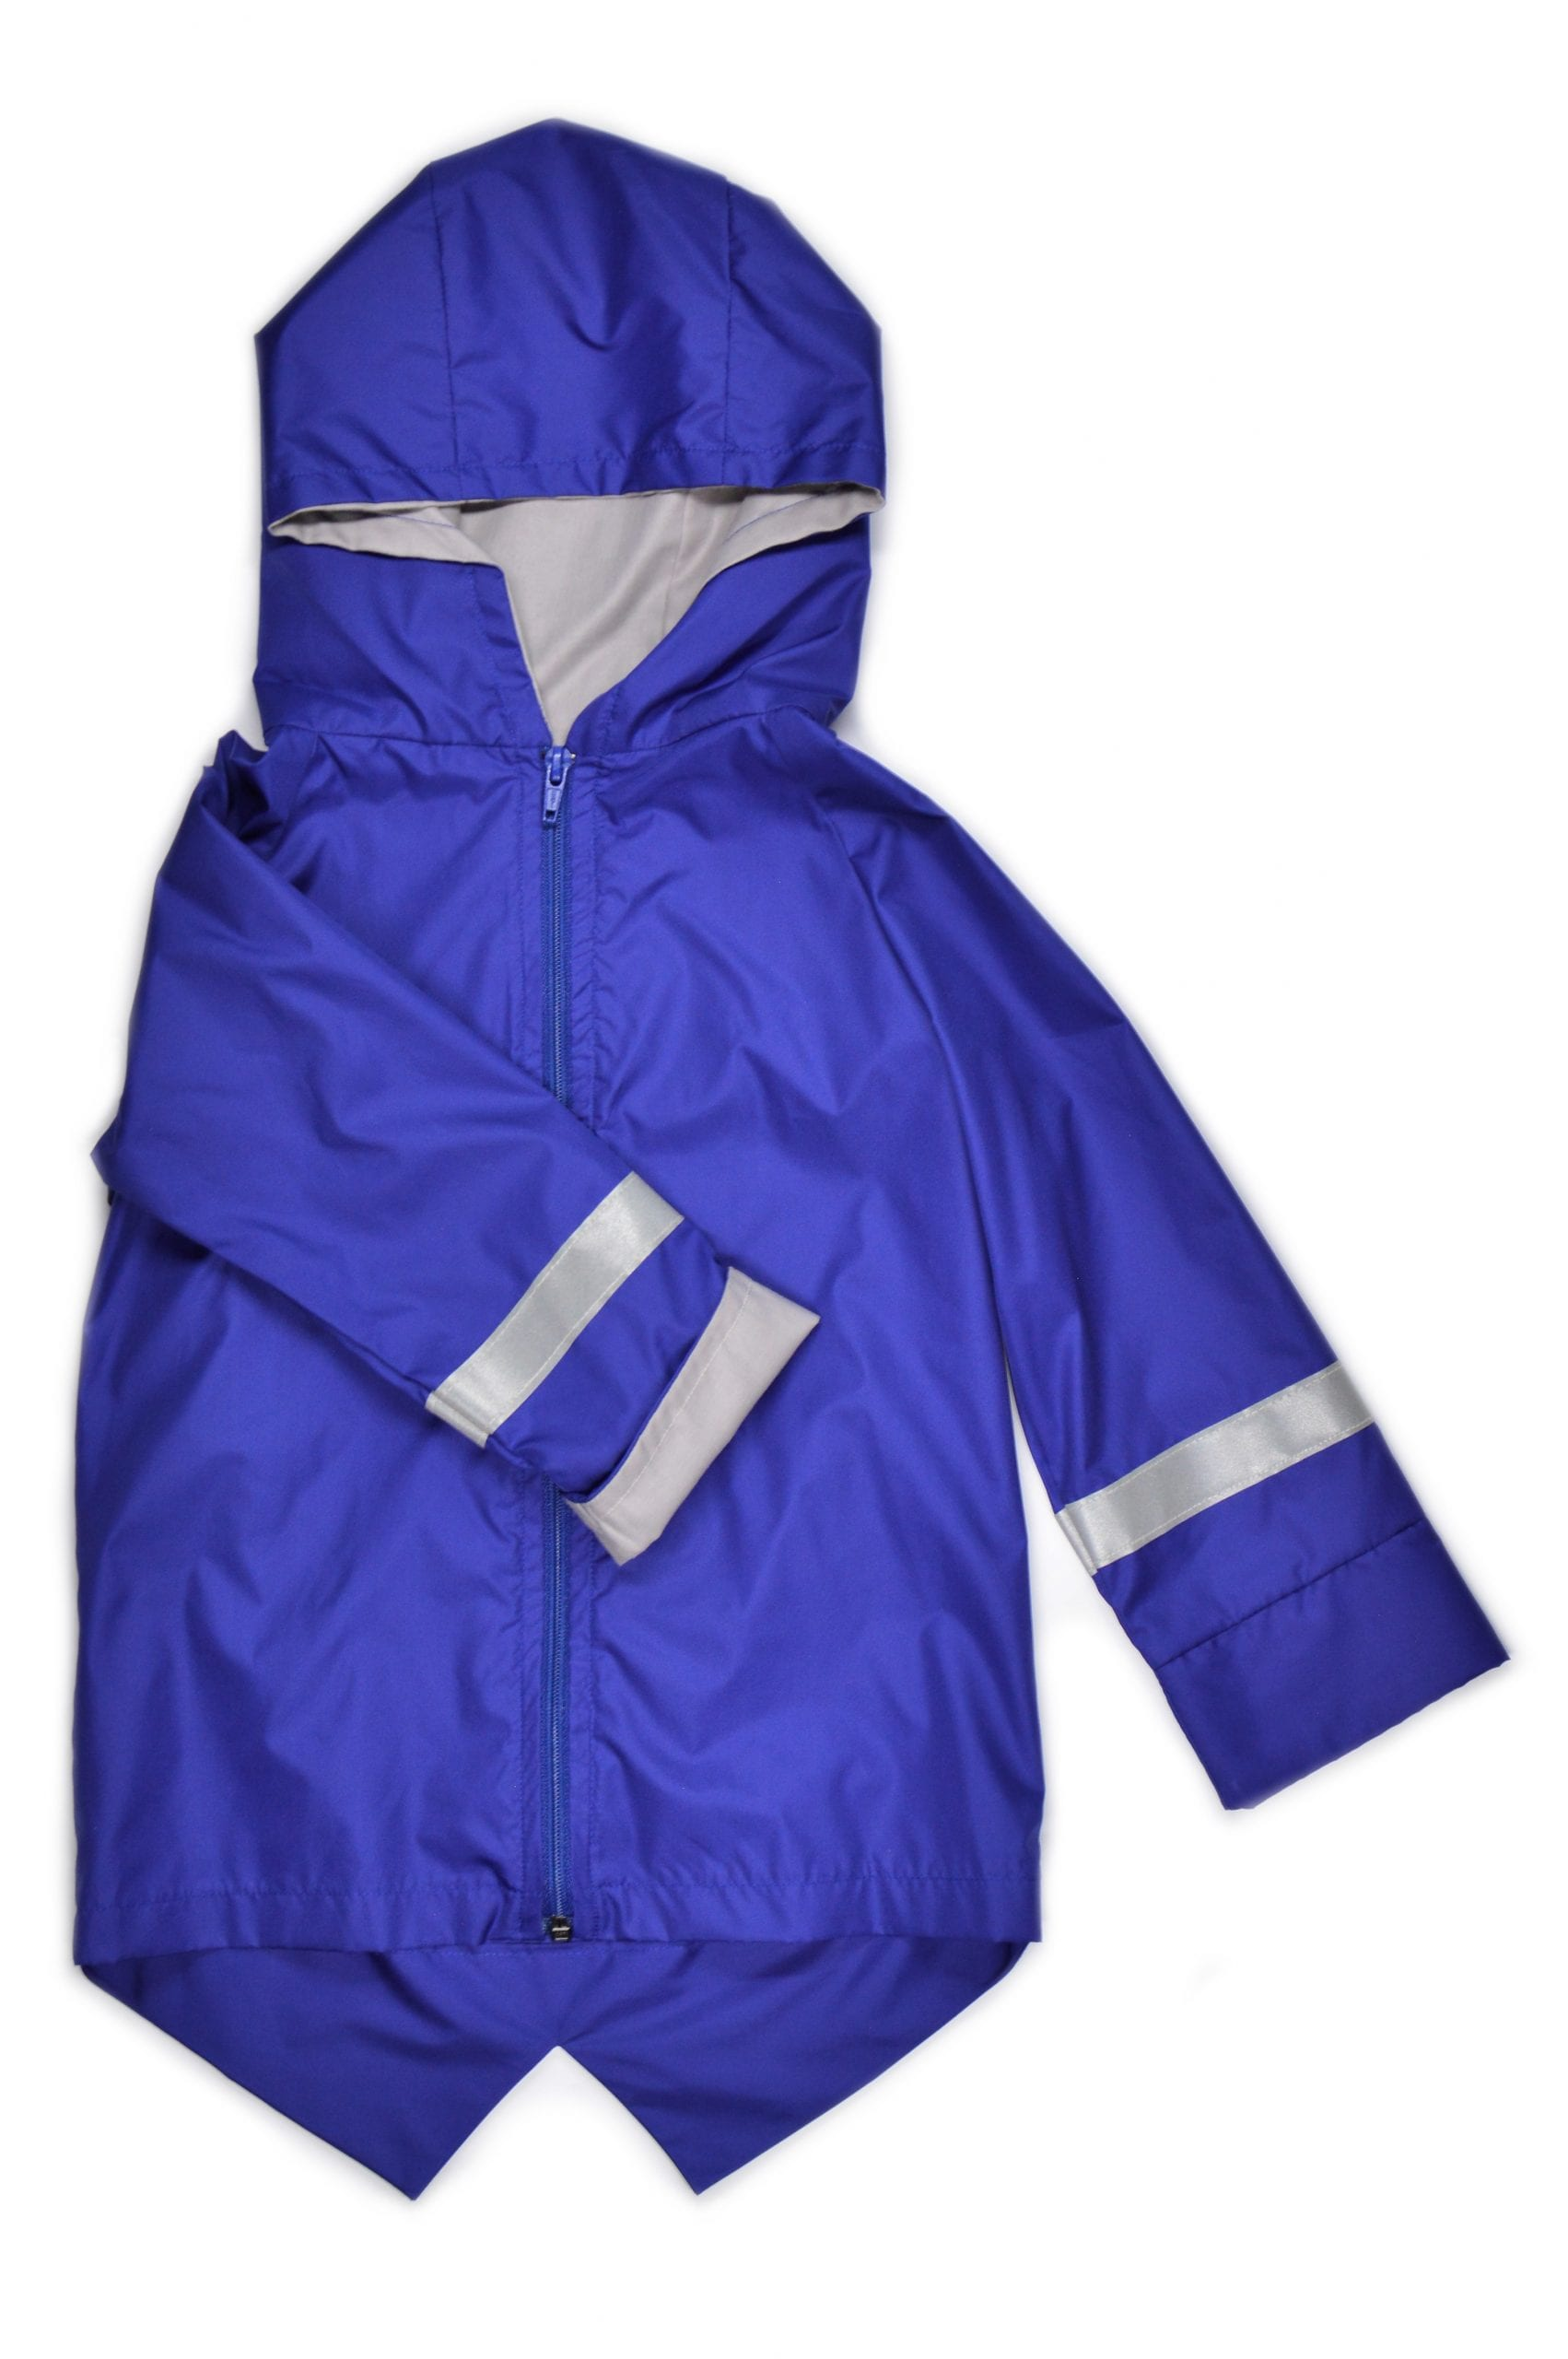 Unisex kids toddler lightweight raincoat – rain parka.